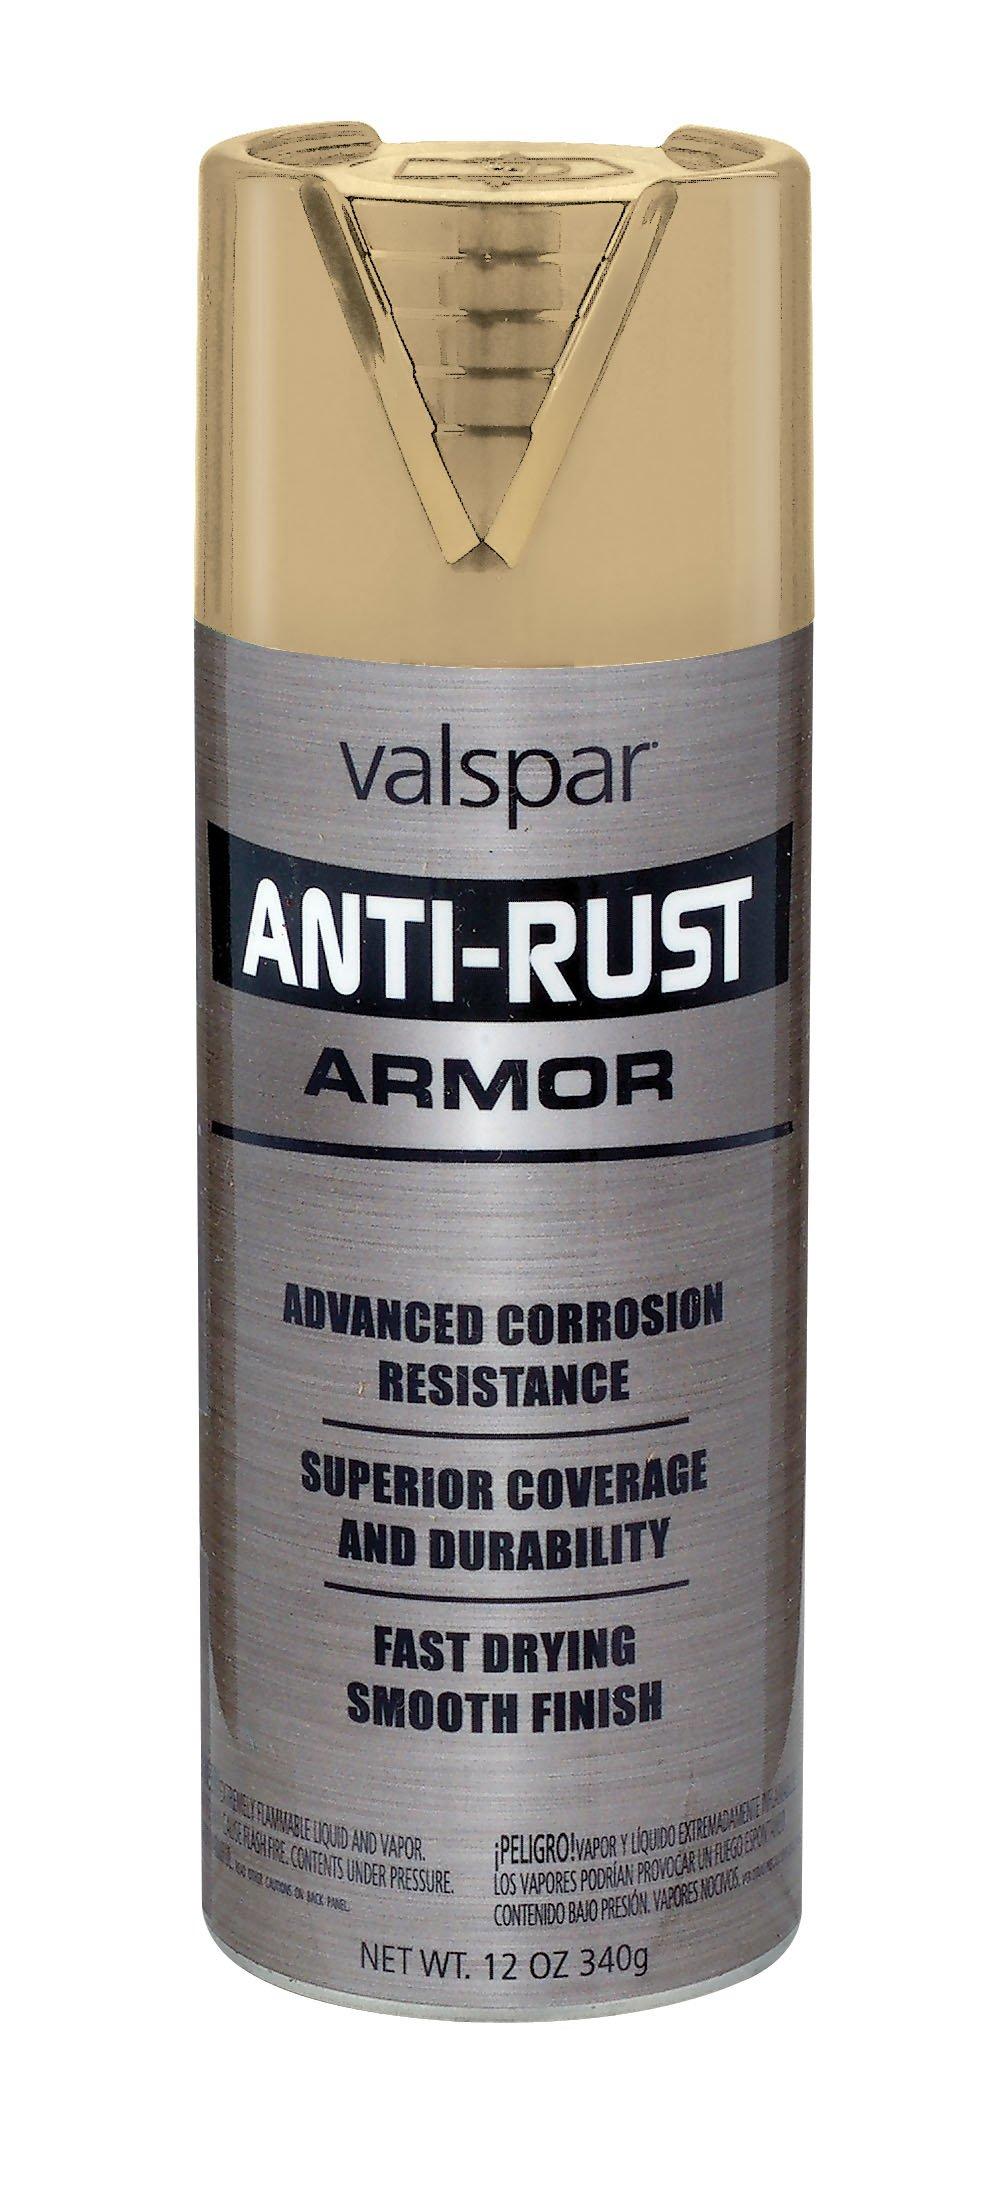 Valspar 21930 Metallic Gold Anti-Rust Armor Spray, 12 oz